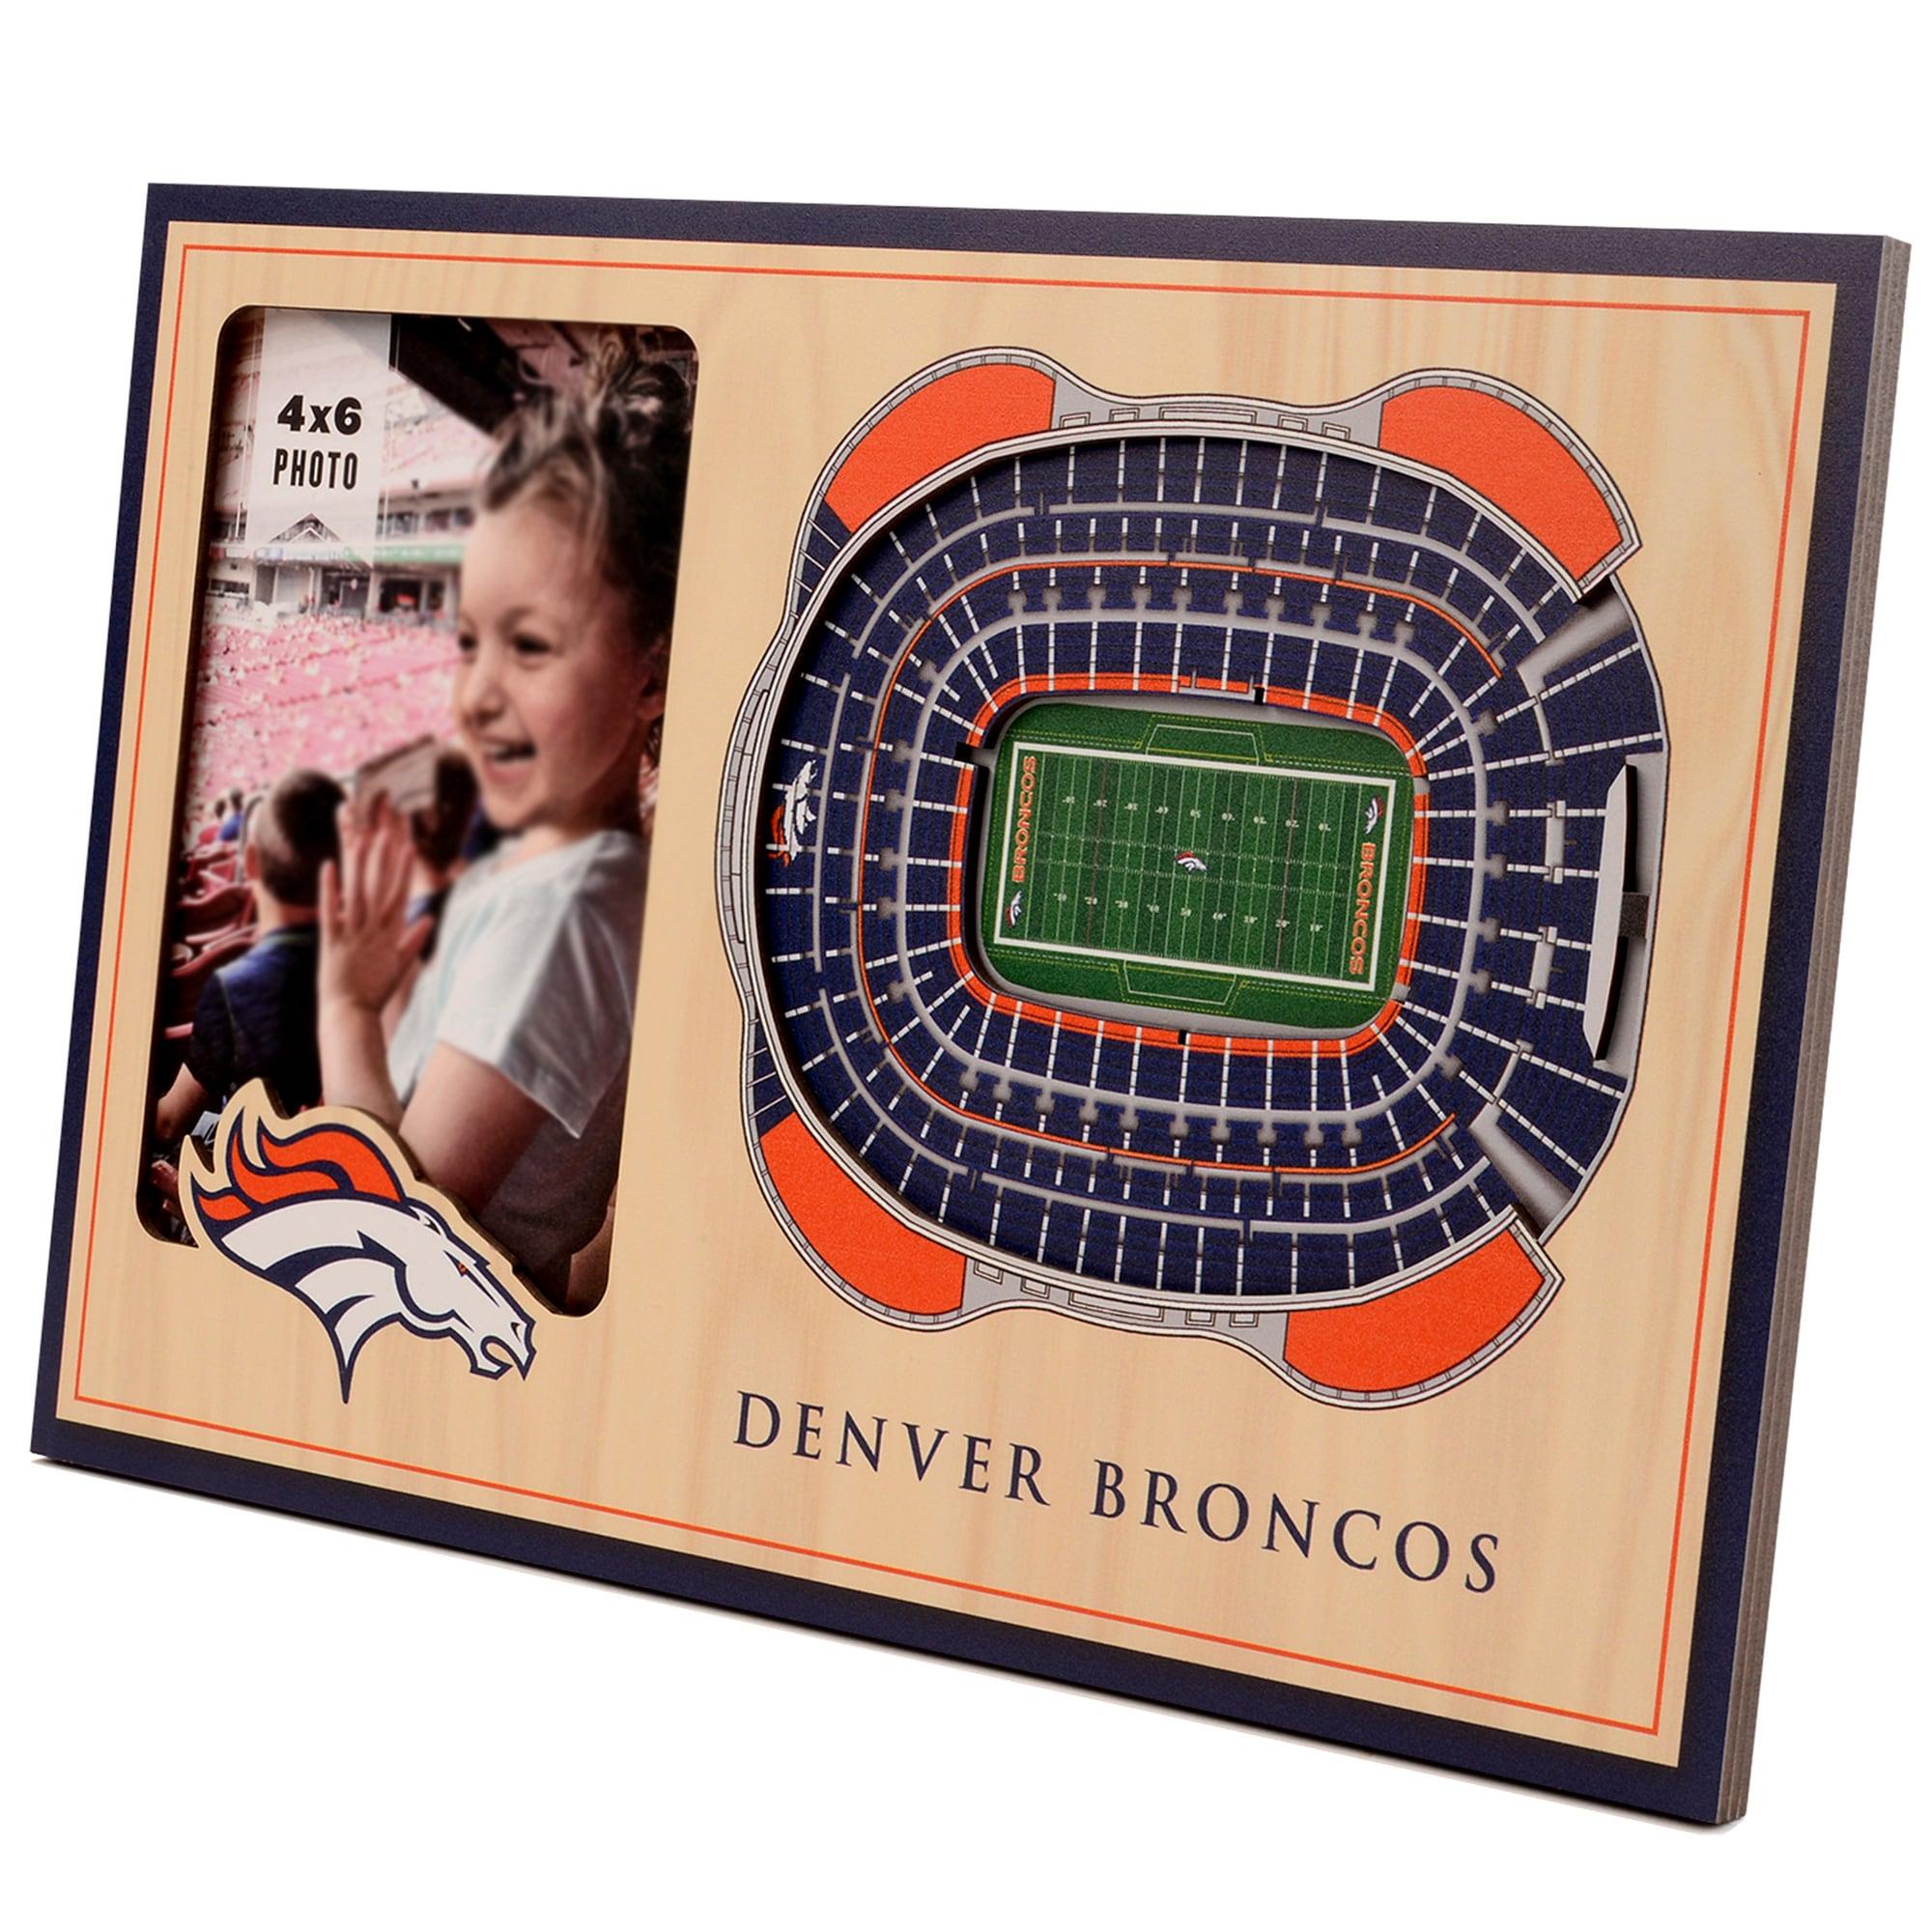 Denver Broncos 3D StadiumViews Picture Frame - Brown